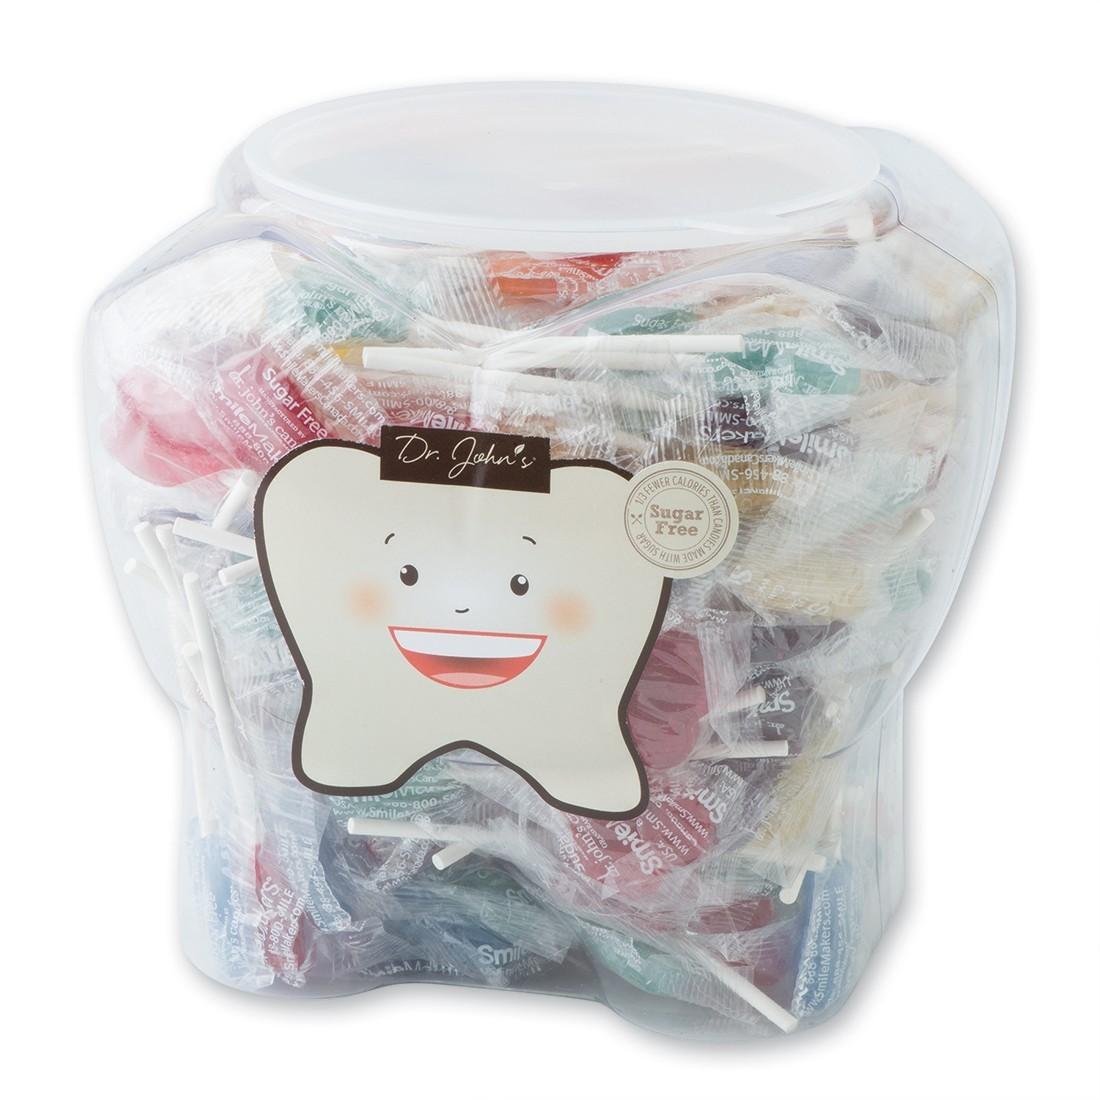 Dr. John's® Sugar Free Lollipops in Tooth Jar [image]